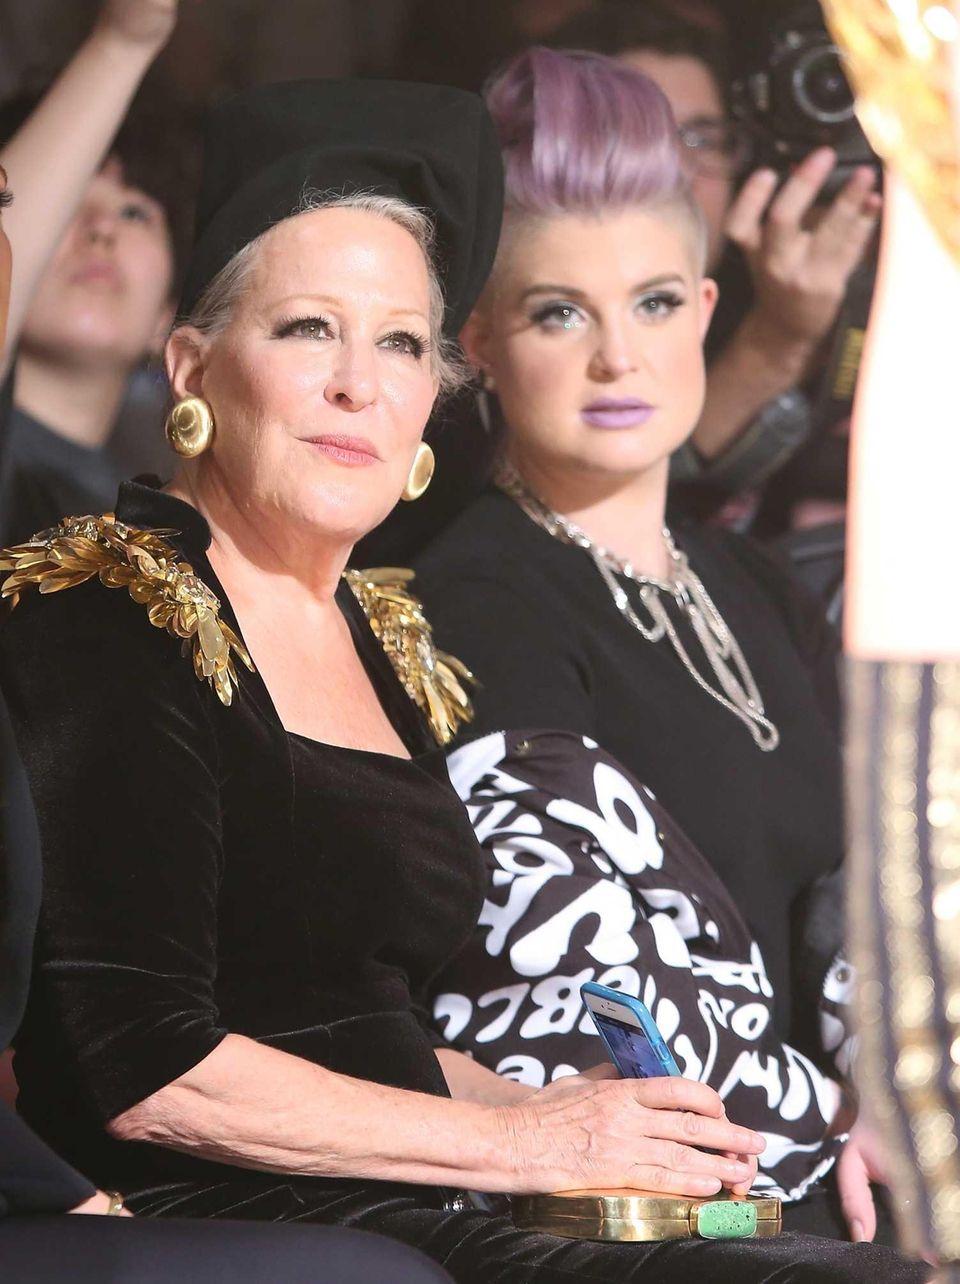 Bette Midler, left, and Kelly Osbourne attend The